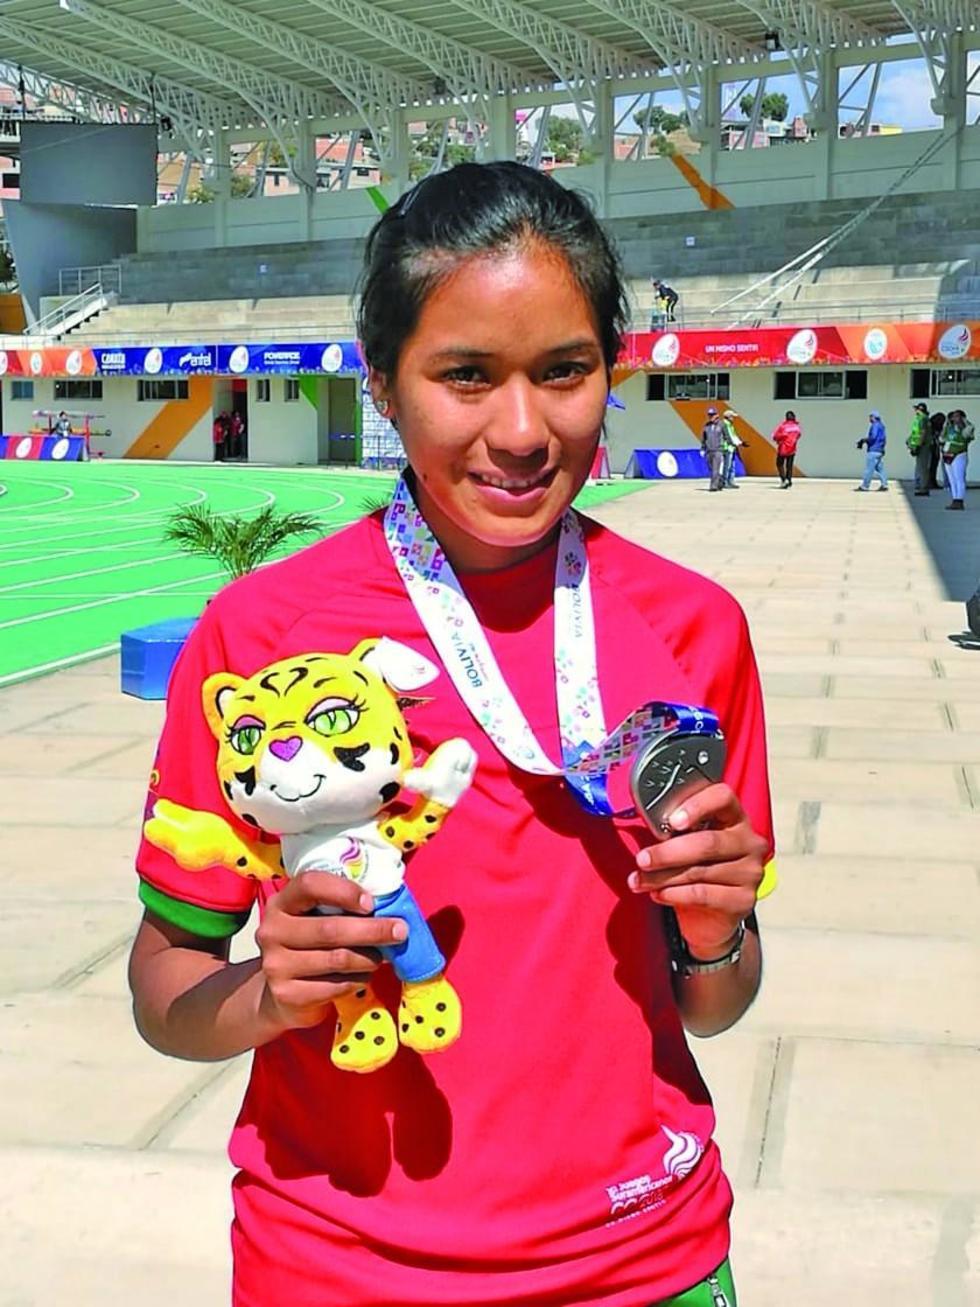 La deportista posa con la medalla conseguida.